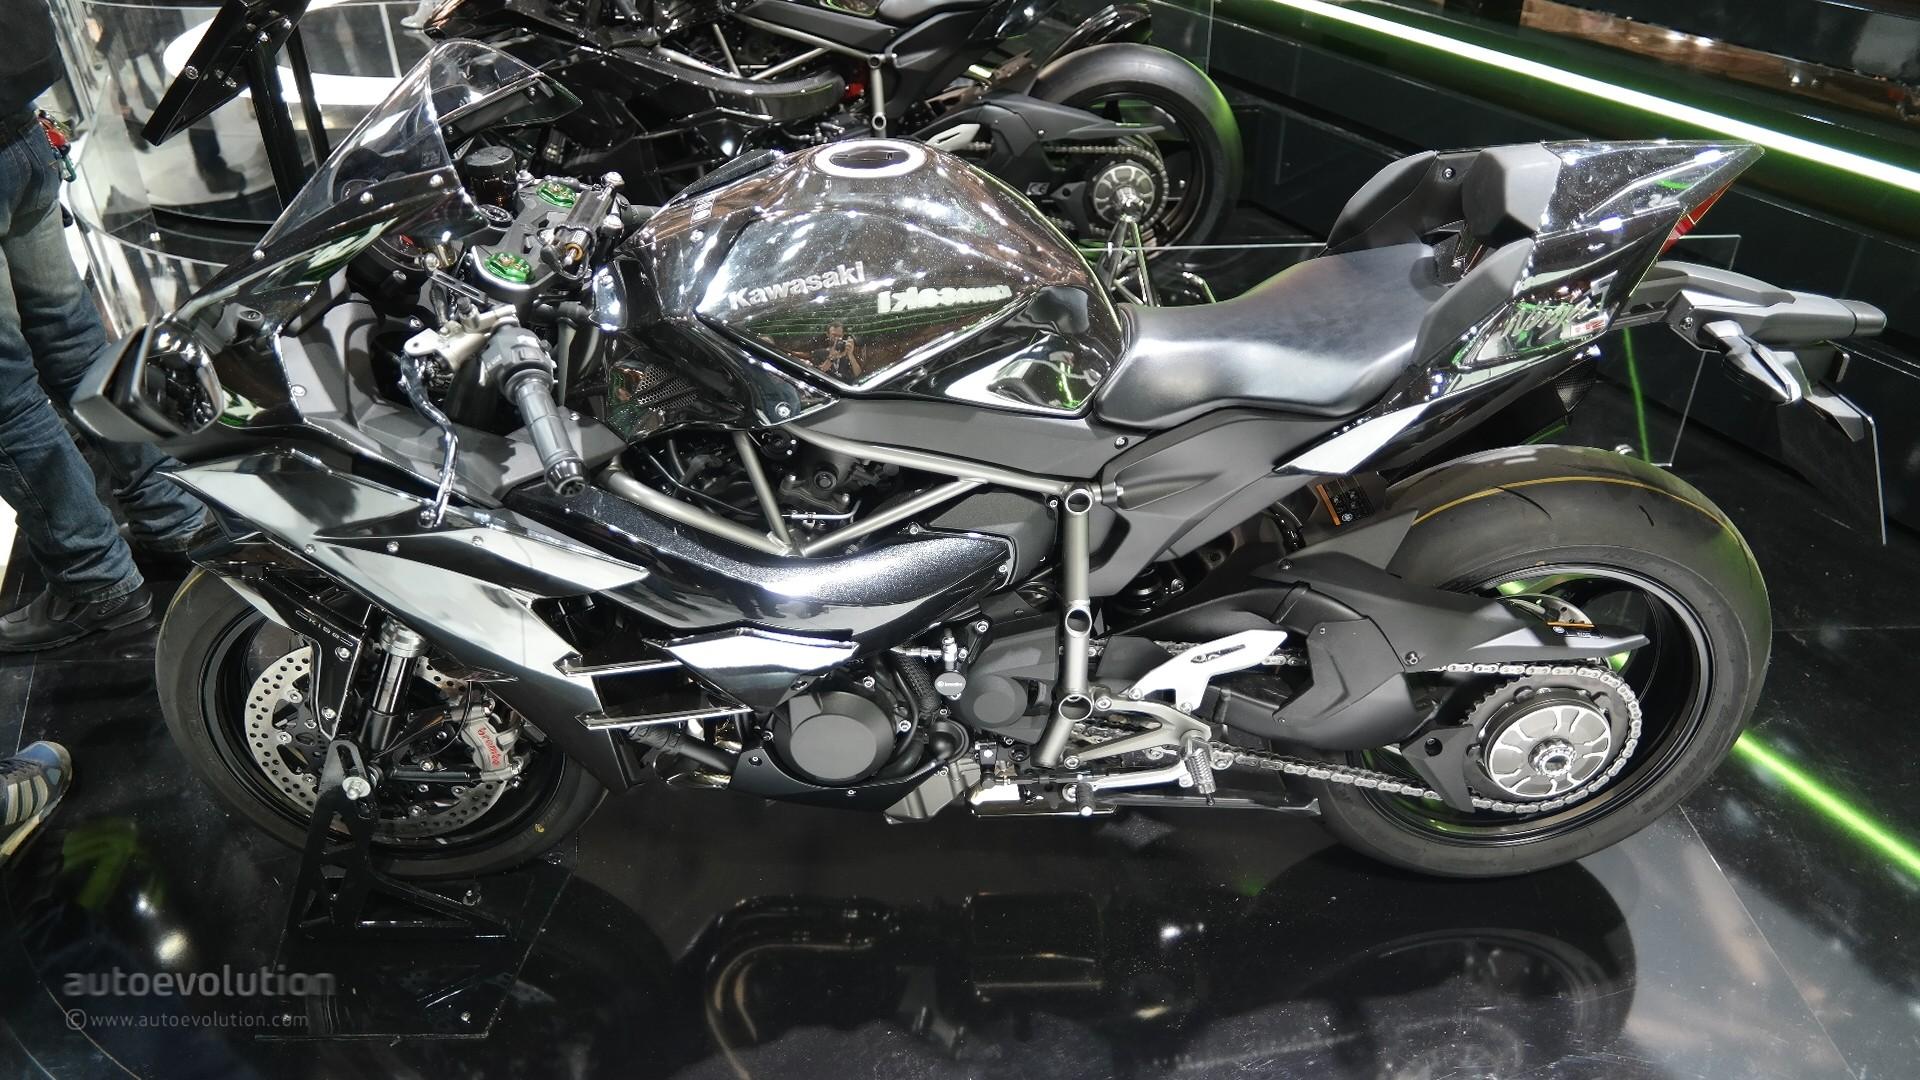 Kawasaki Ninja H2r >> 2016 Kawasaki Ninja H2 Seen from Up-Close, Priced - autoevolution